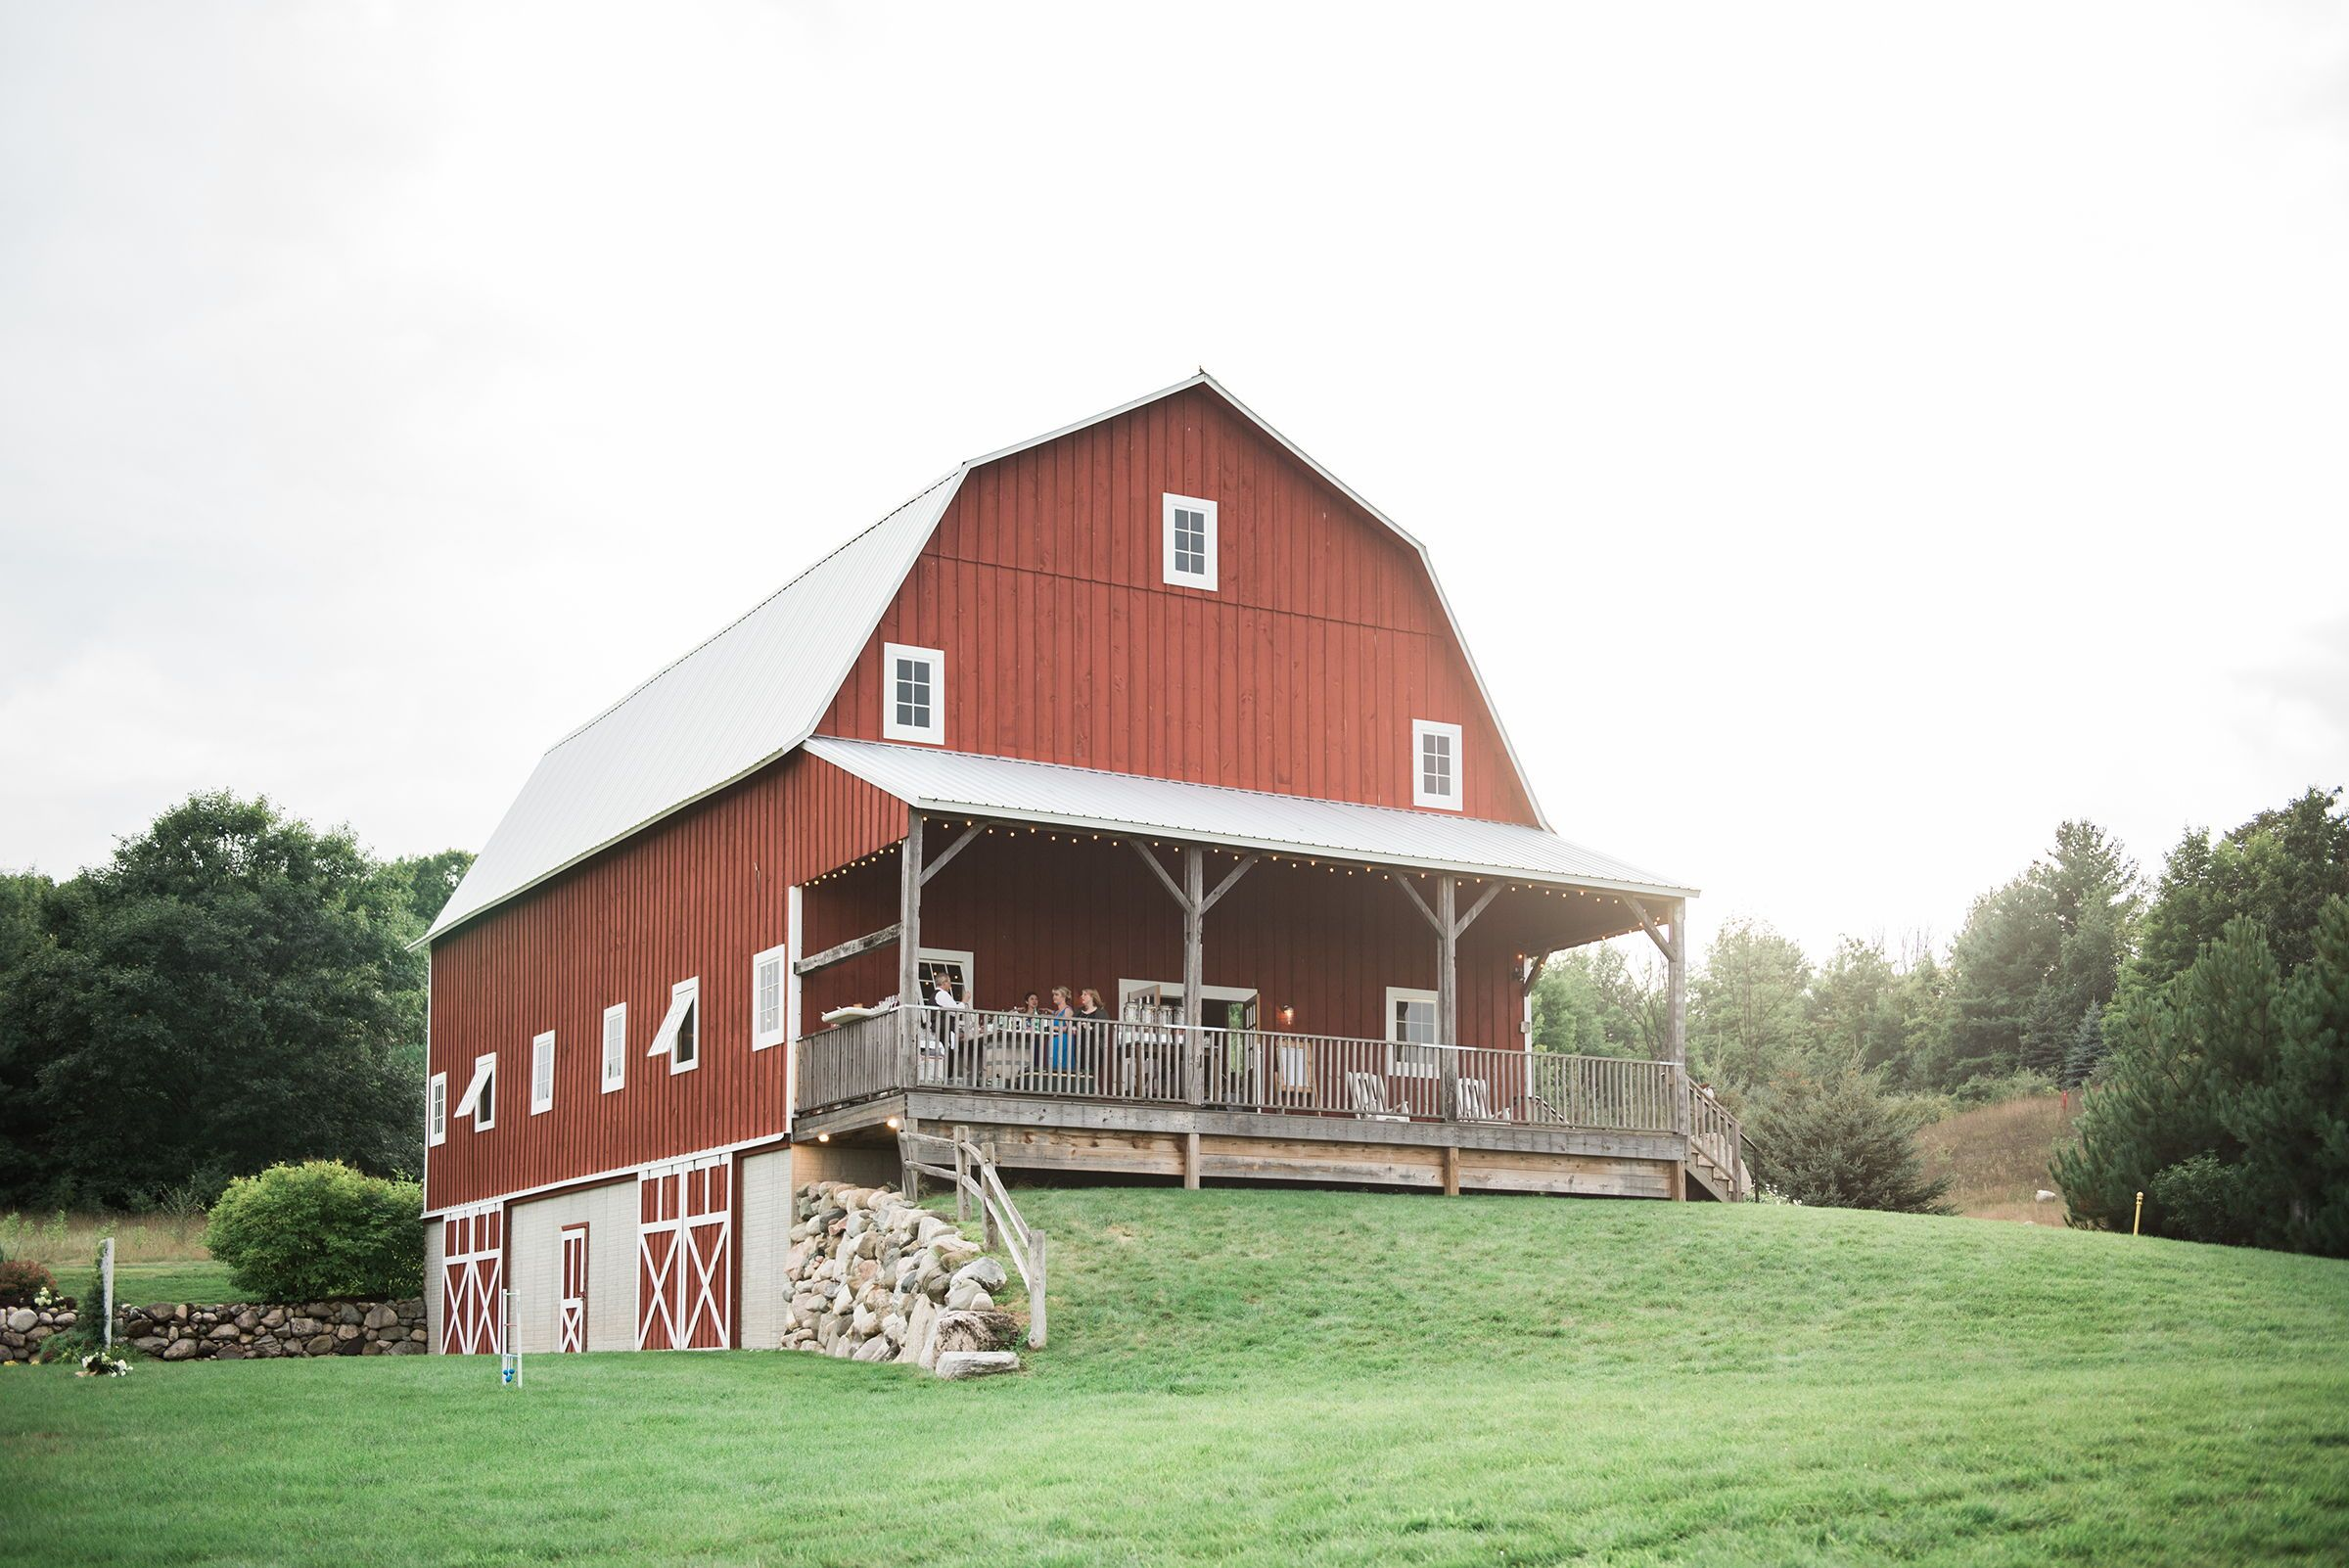 A Barn Wedding Near Traverse City, Michigan | Michigan ...